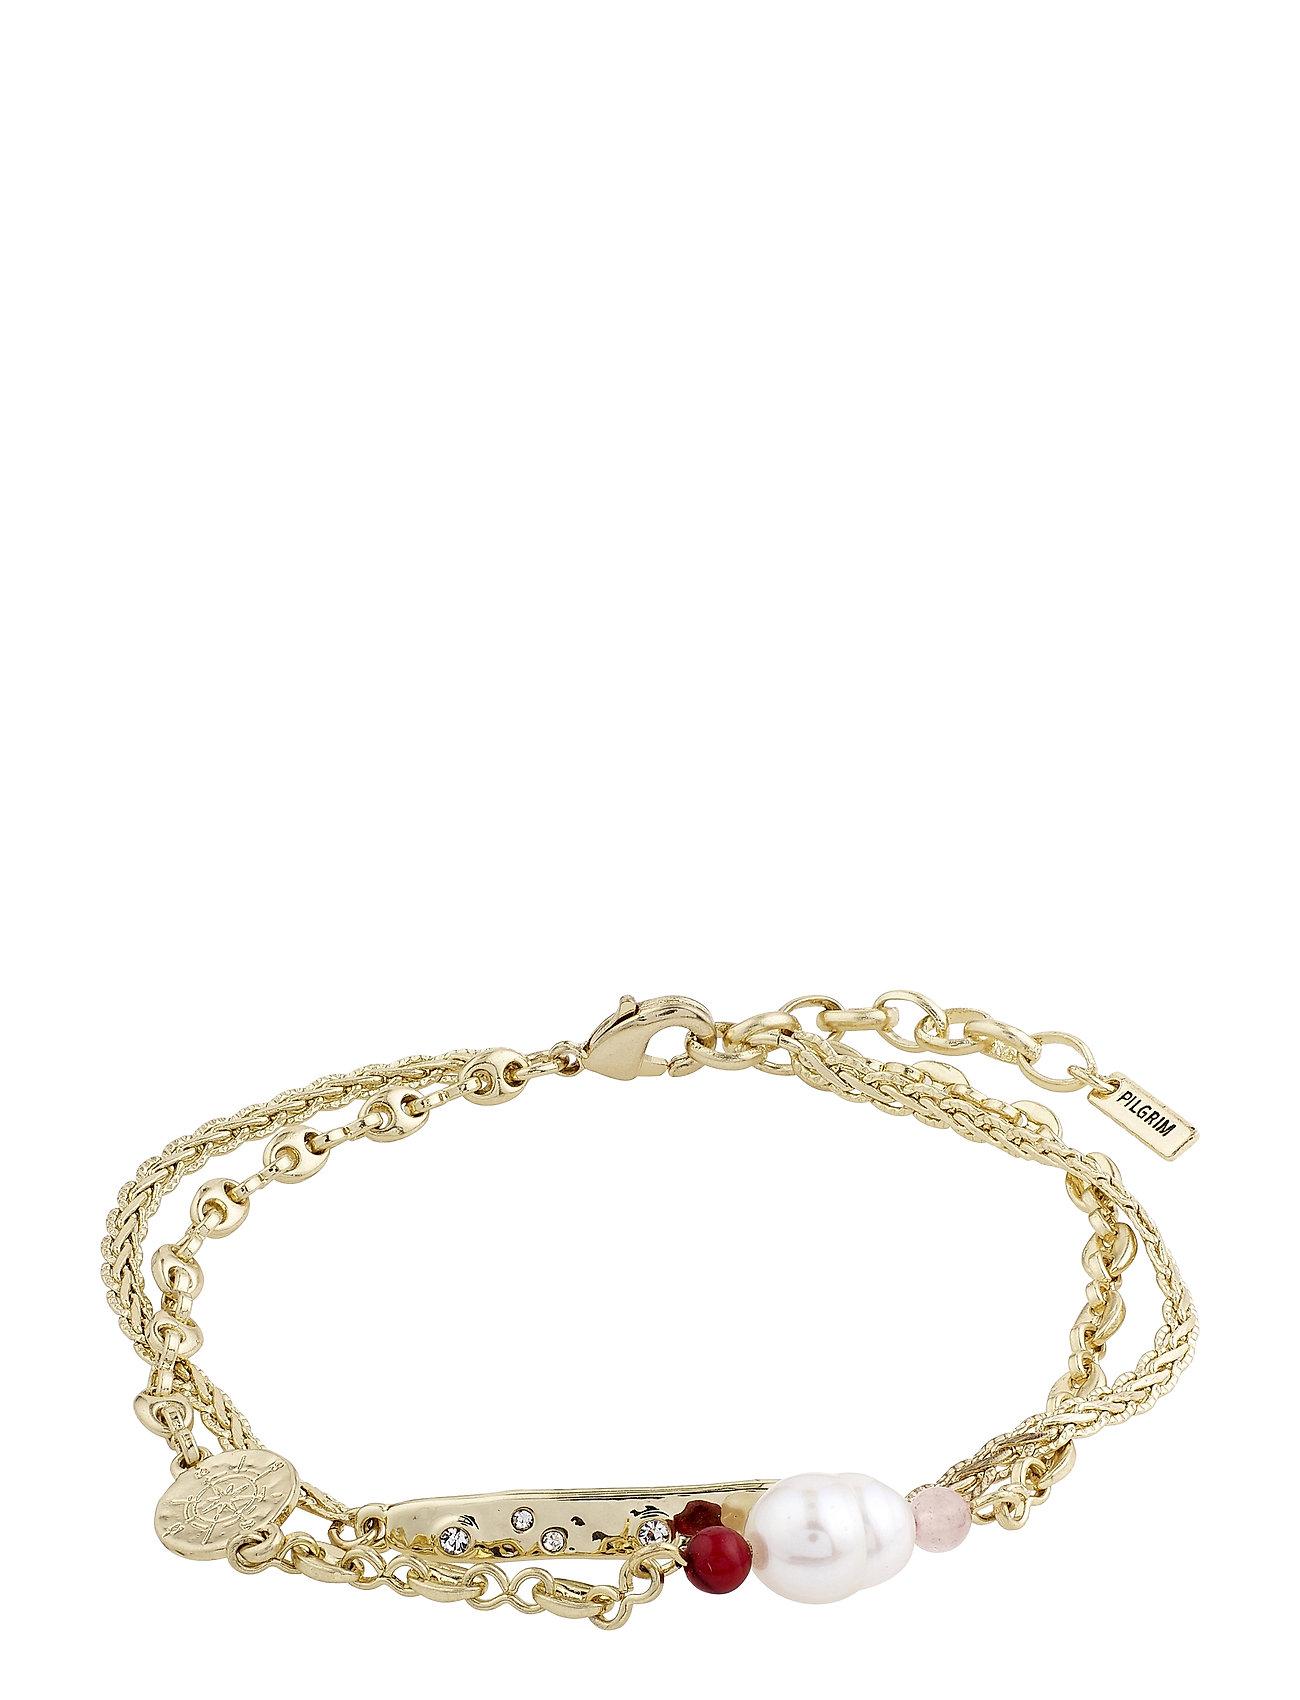 Bracelet Poesy Gold Plated Multi Accessories Jewellery Bracelets Chain Bracelets Guld Pilgrim